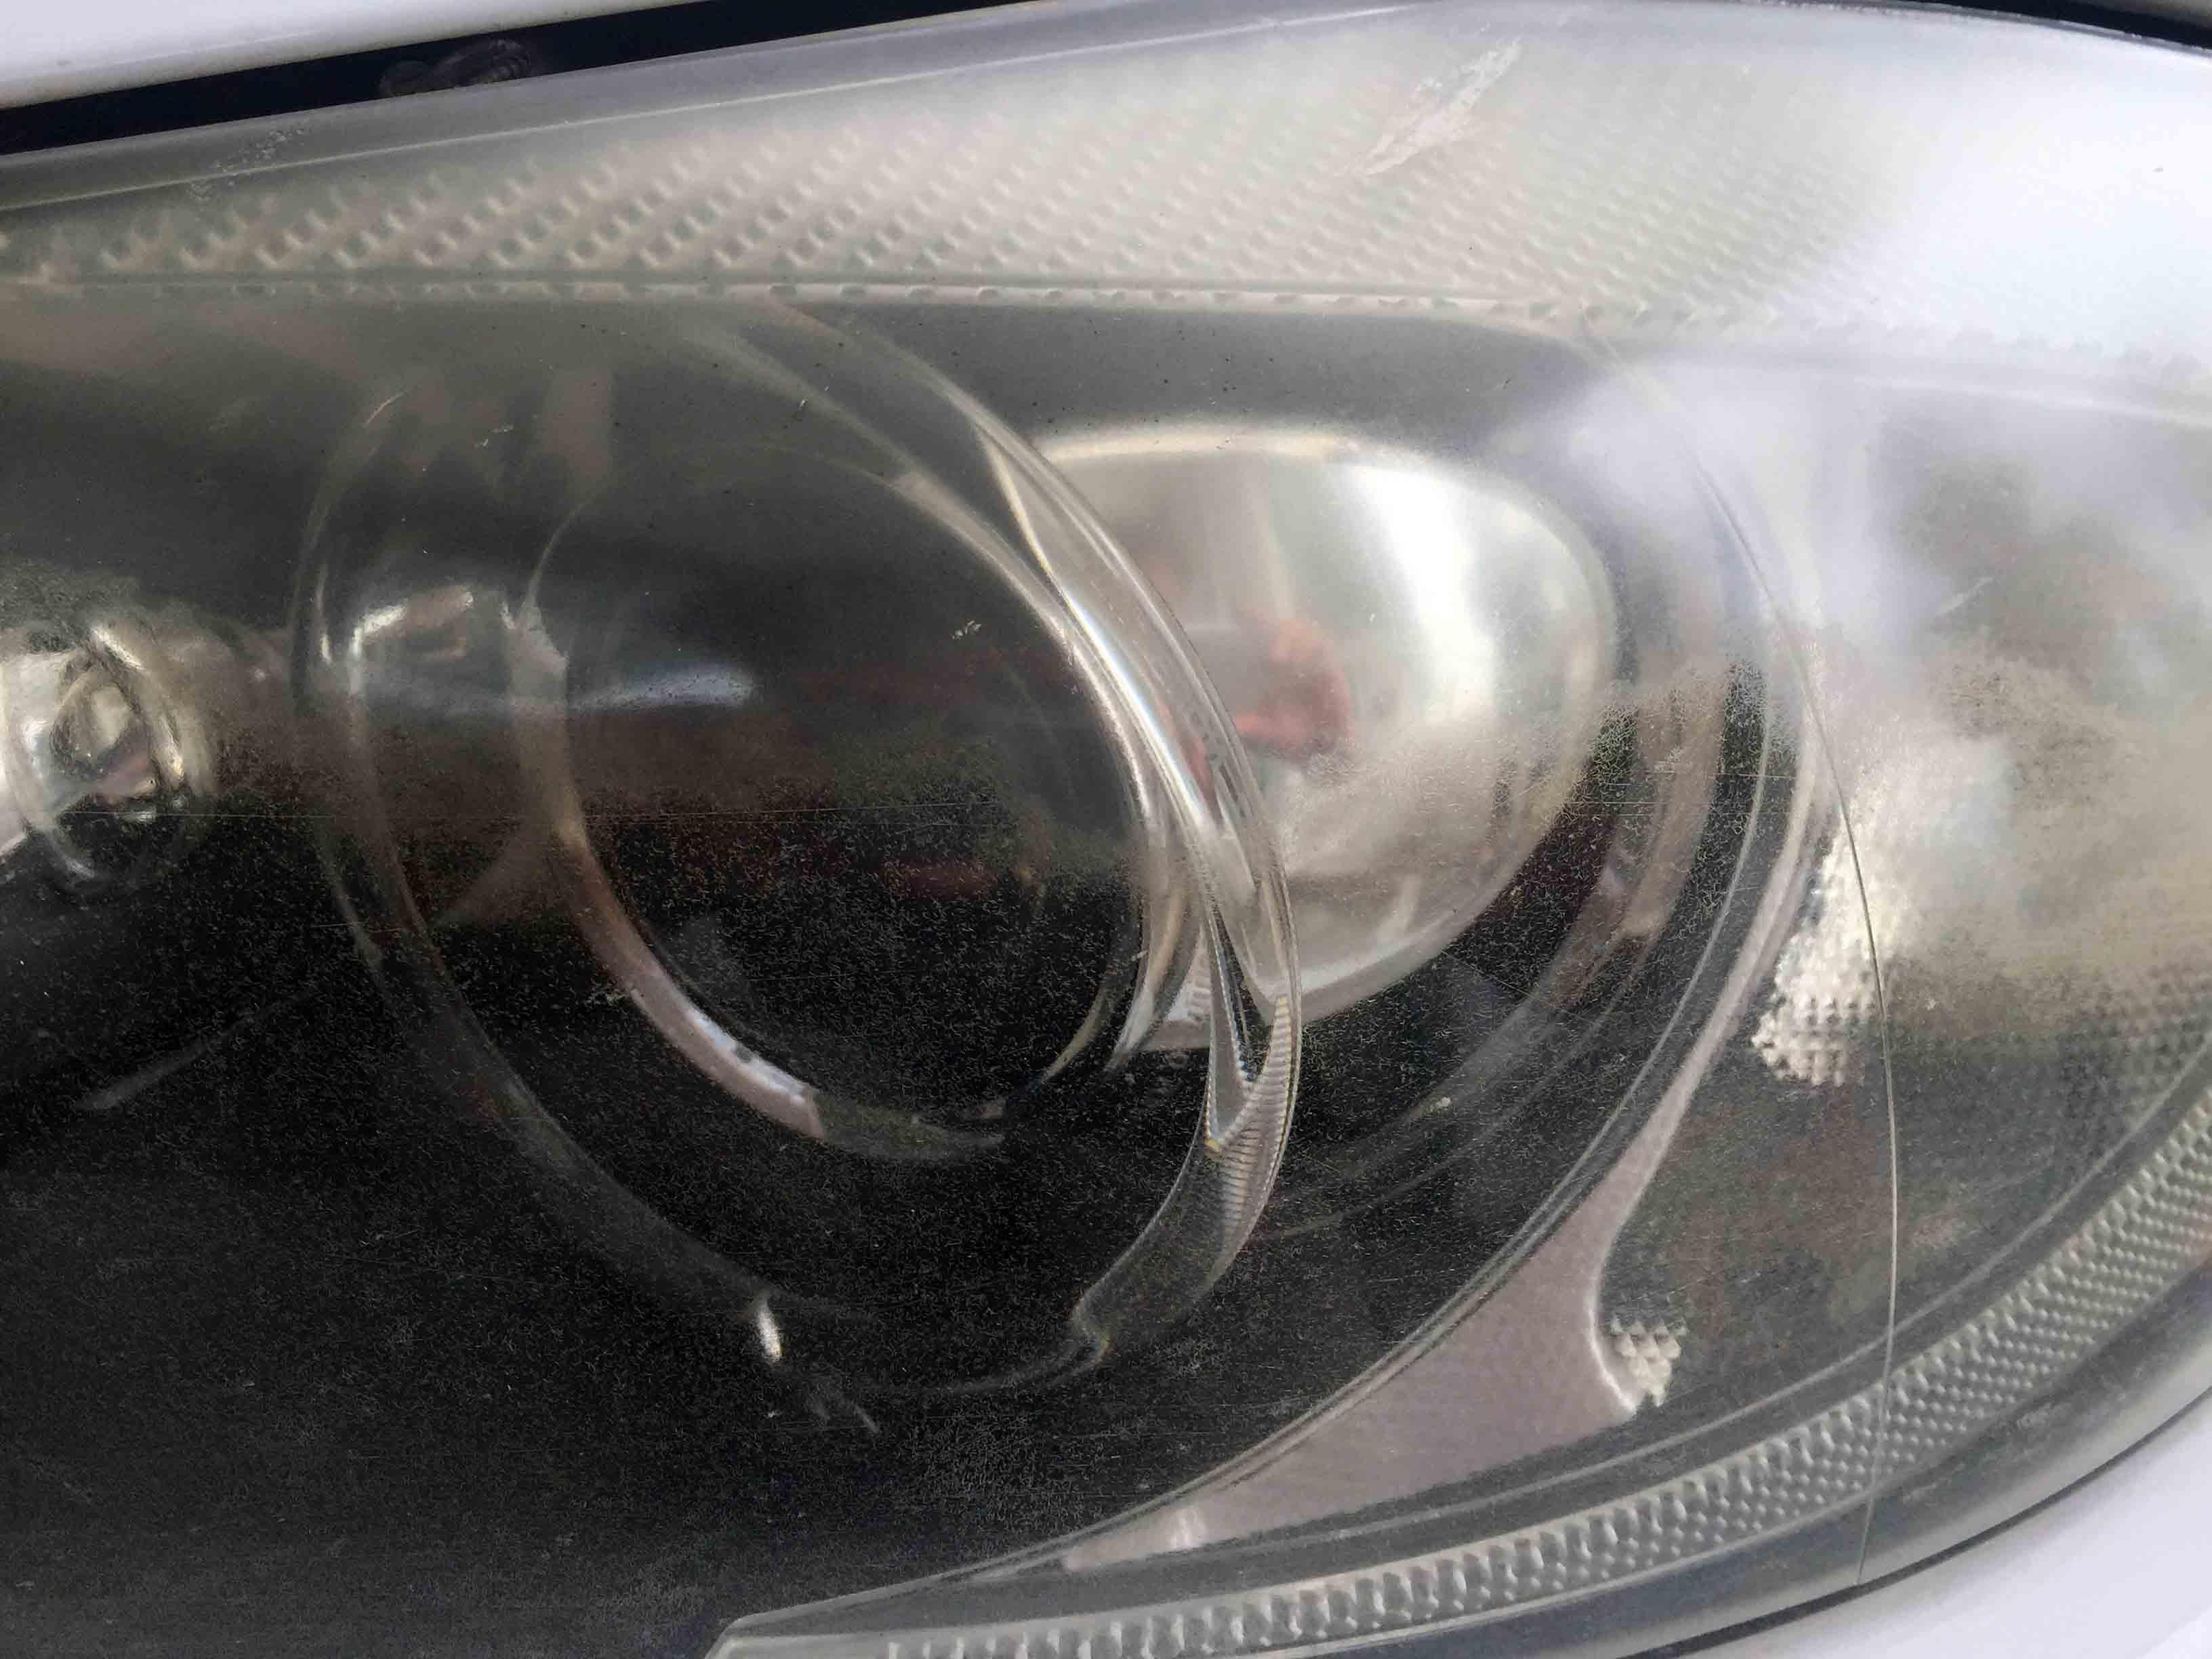 BMW3シリーズE91の劣化が進行したヘッドライトに多数のクラックが発生